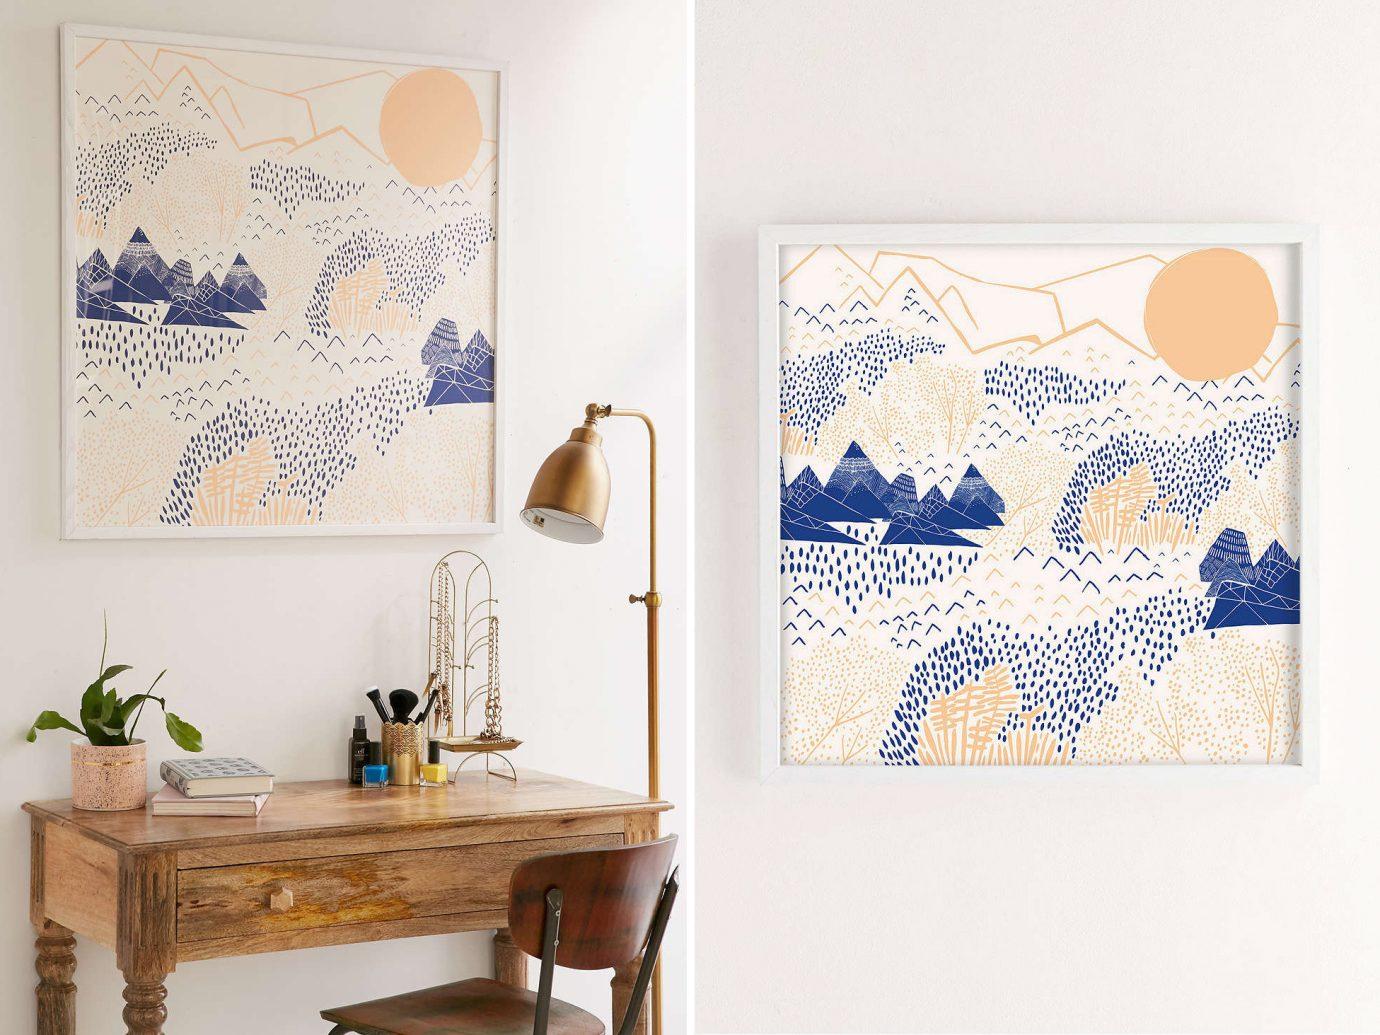 Style + Design wall modern art art Design interior design drawing illustration sketch picture frame